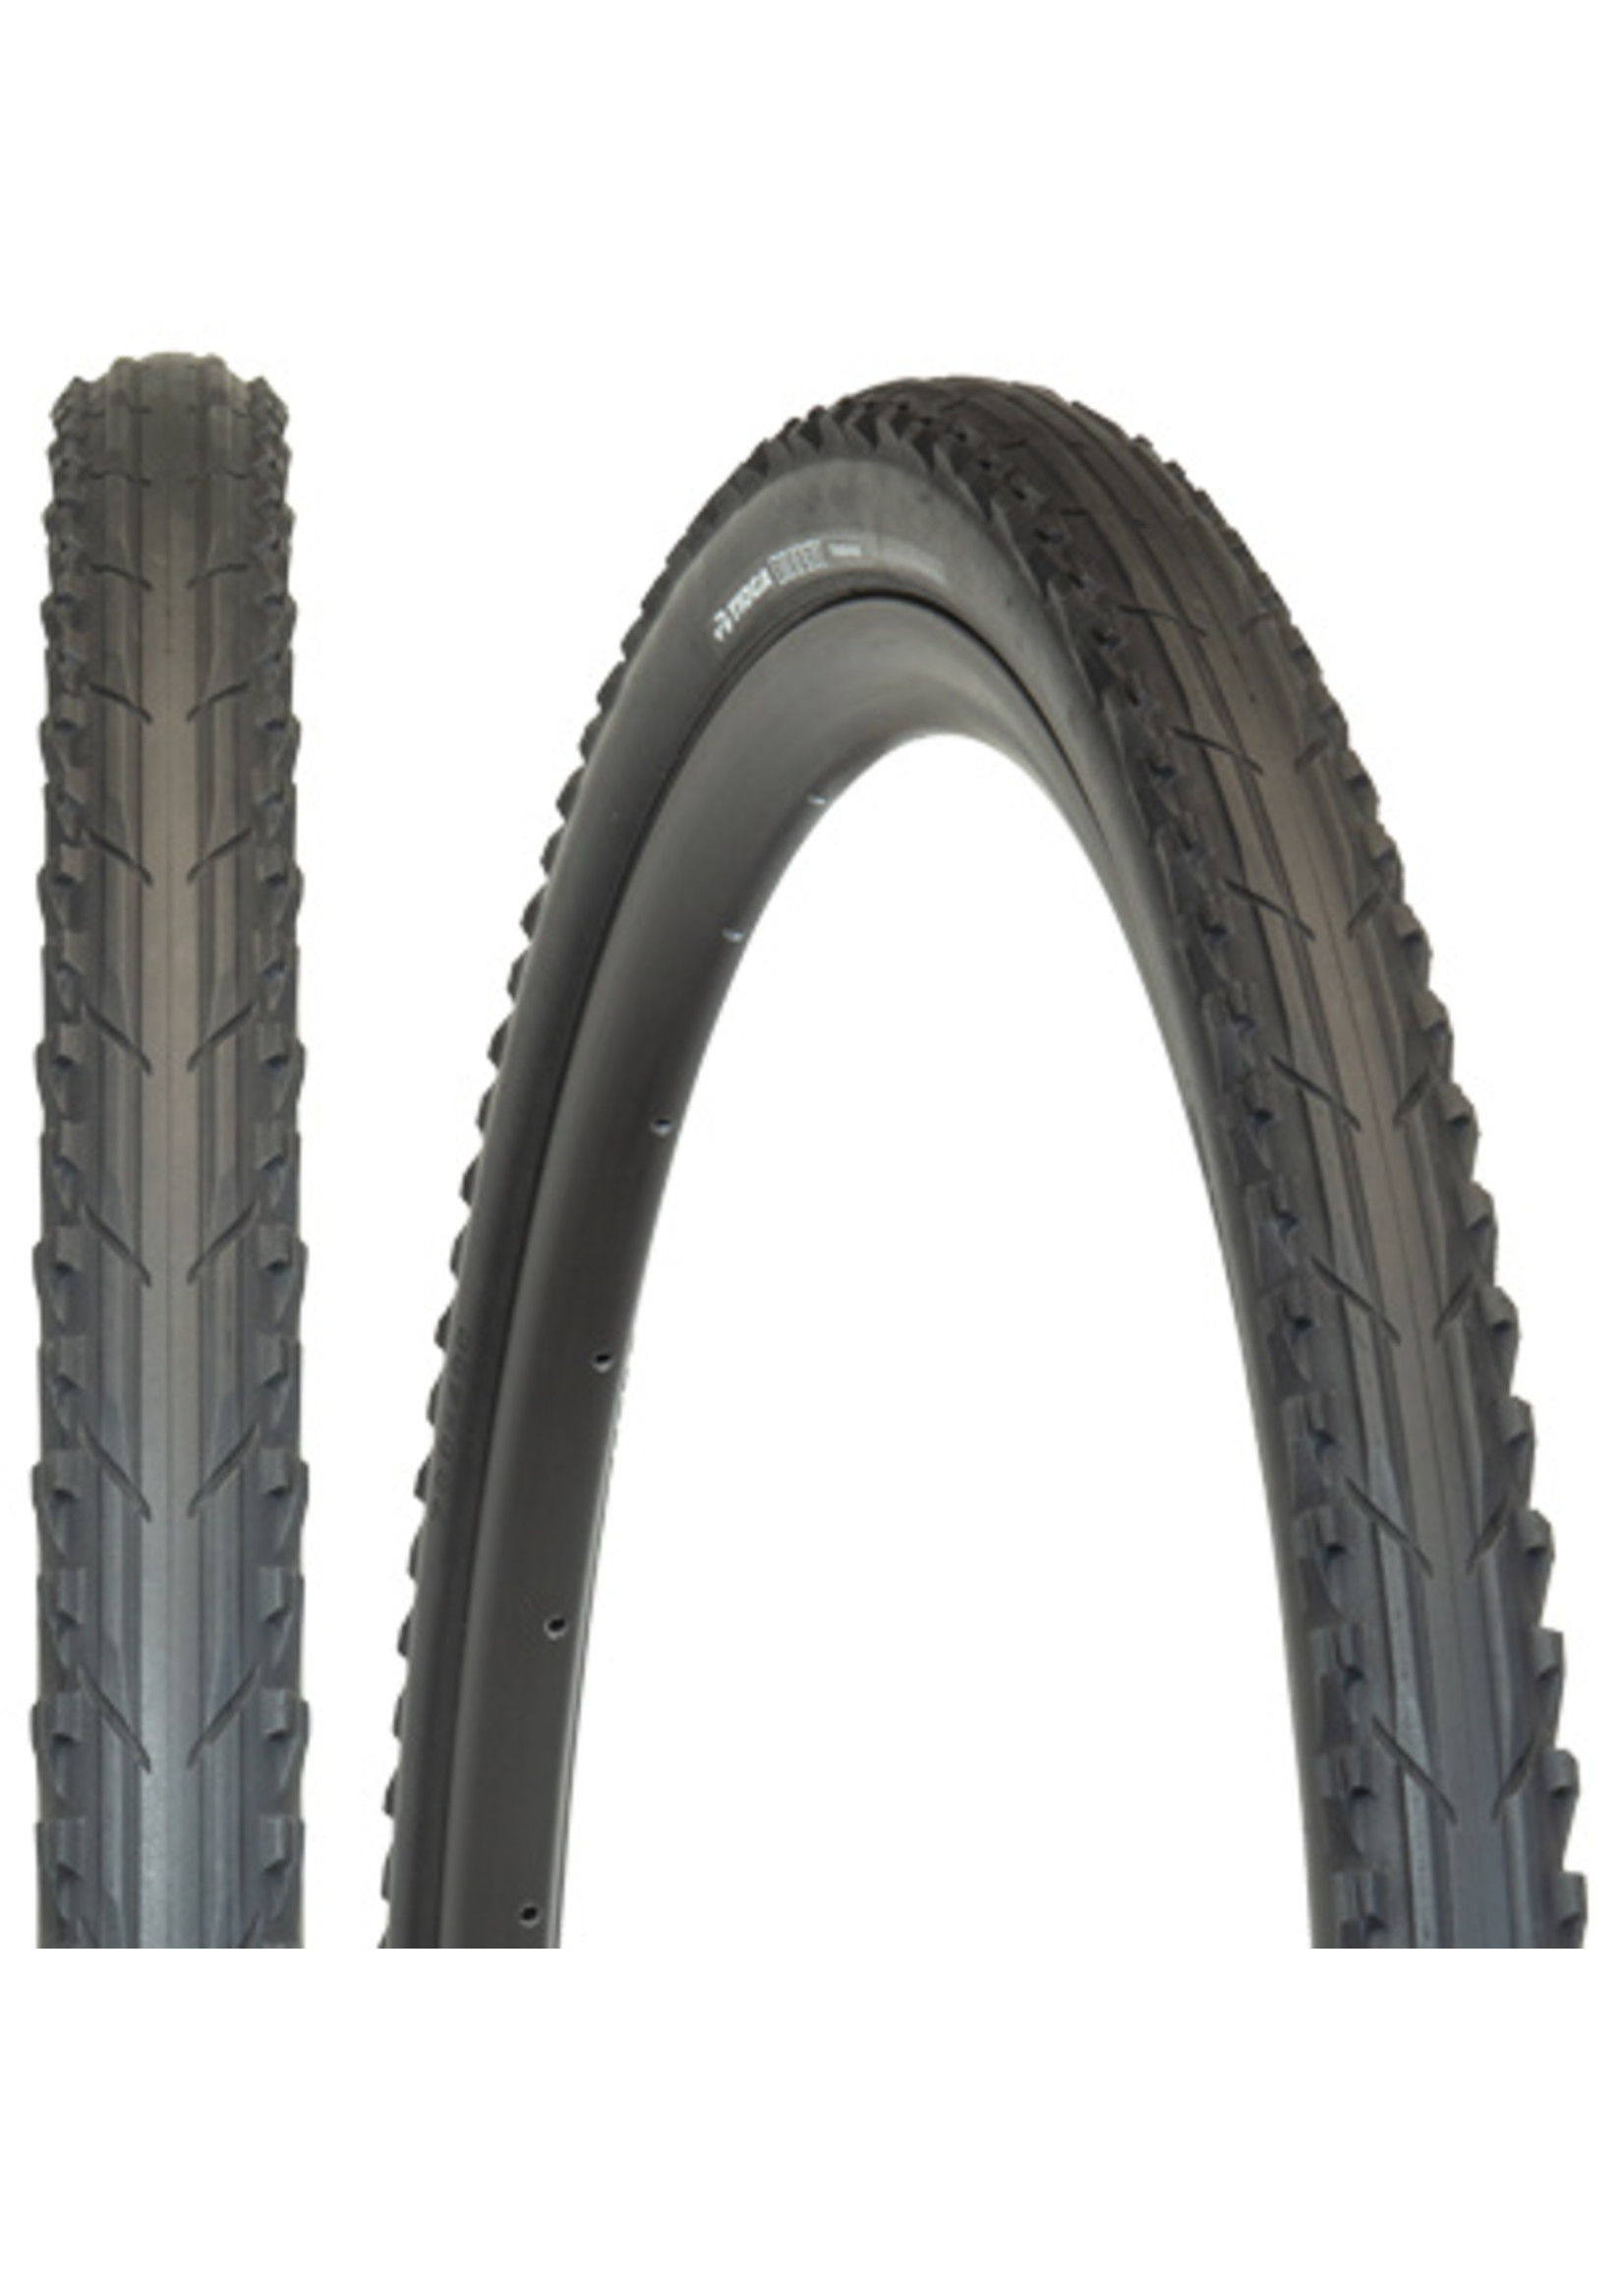 TIOGA TIOGA BINARY 700X40  FOLDING Tire